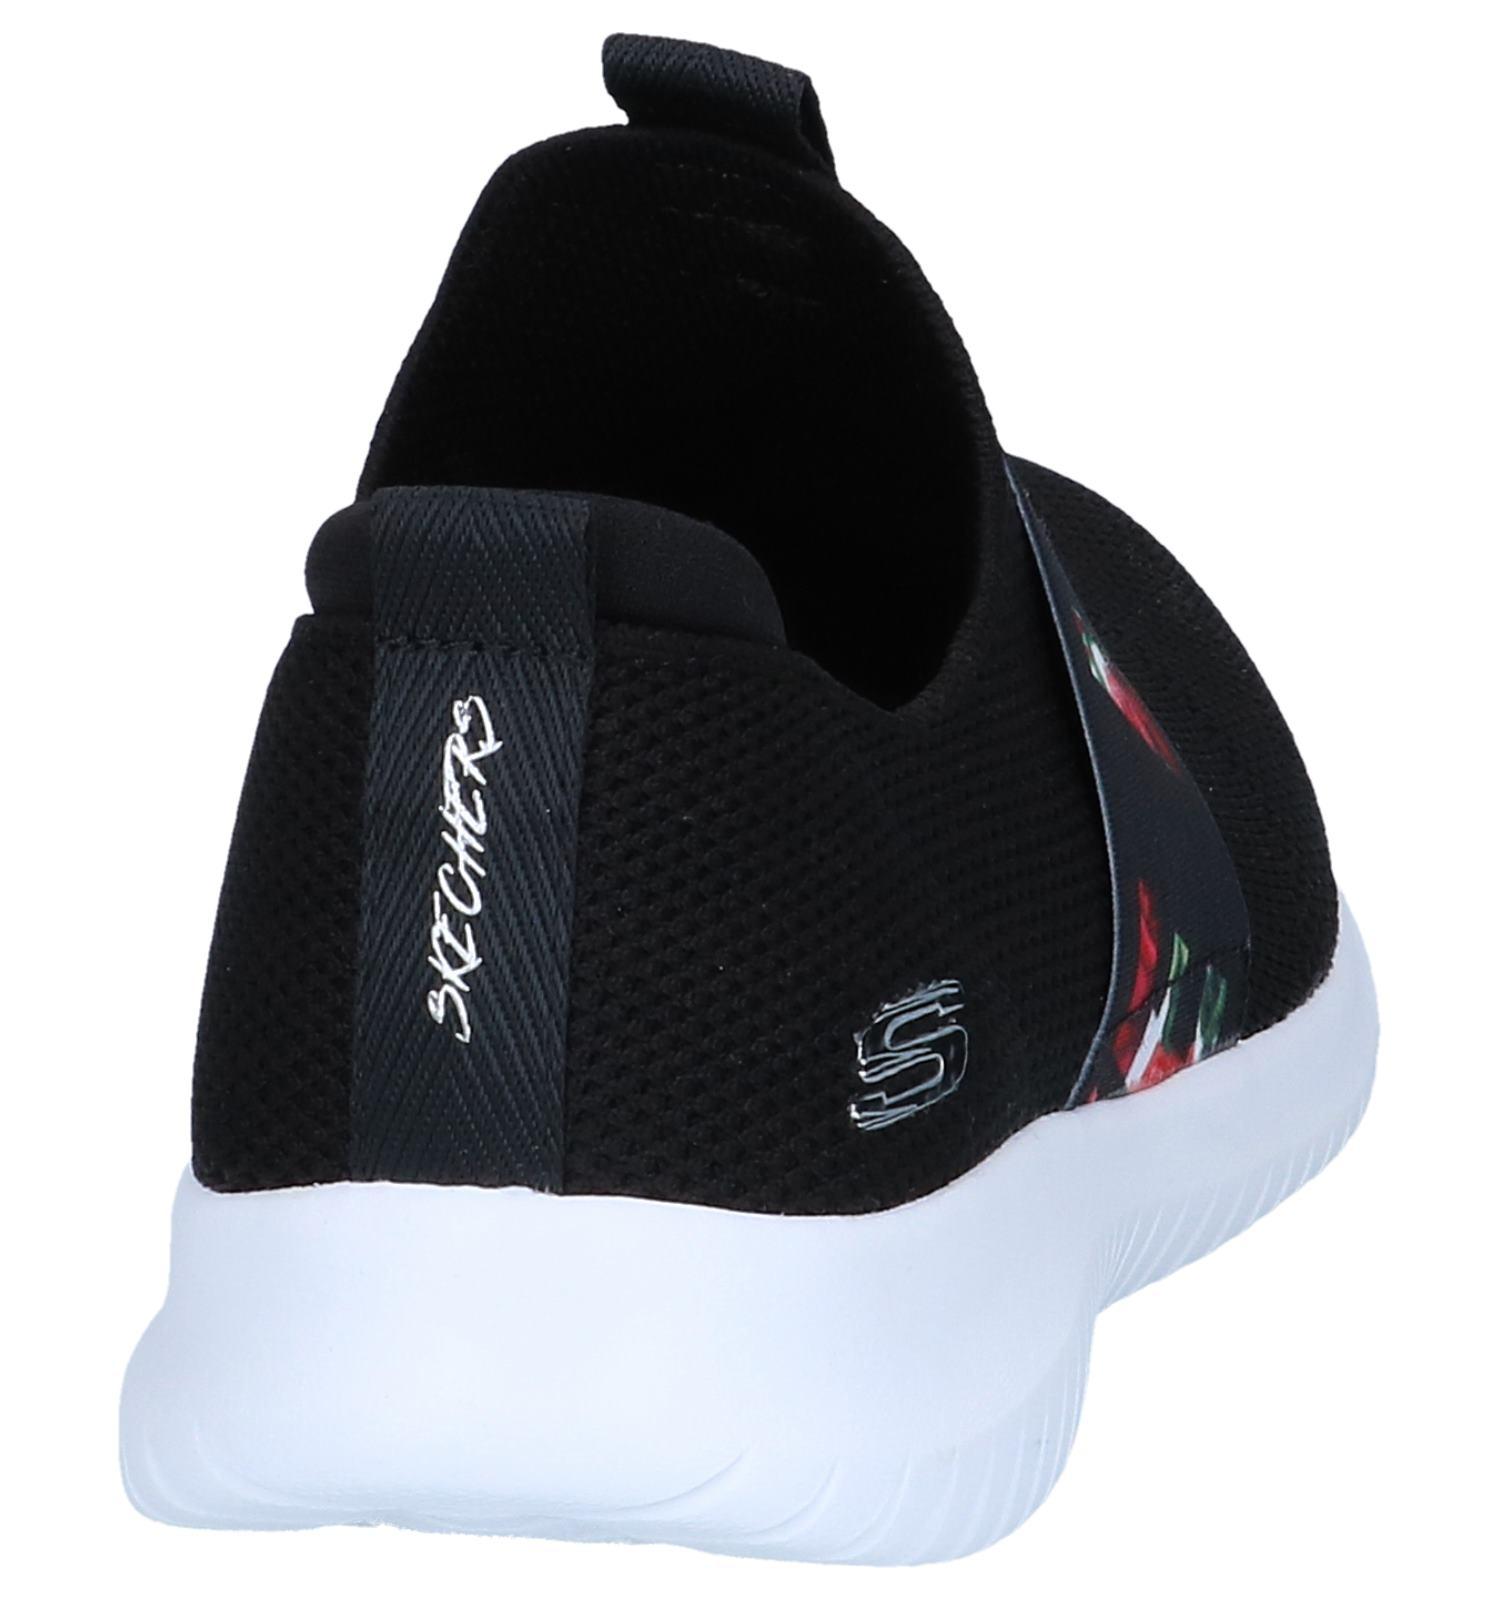 Flex Skechers Zwarte First Love Sneakers Ultra reWQdCxoB